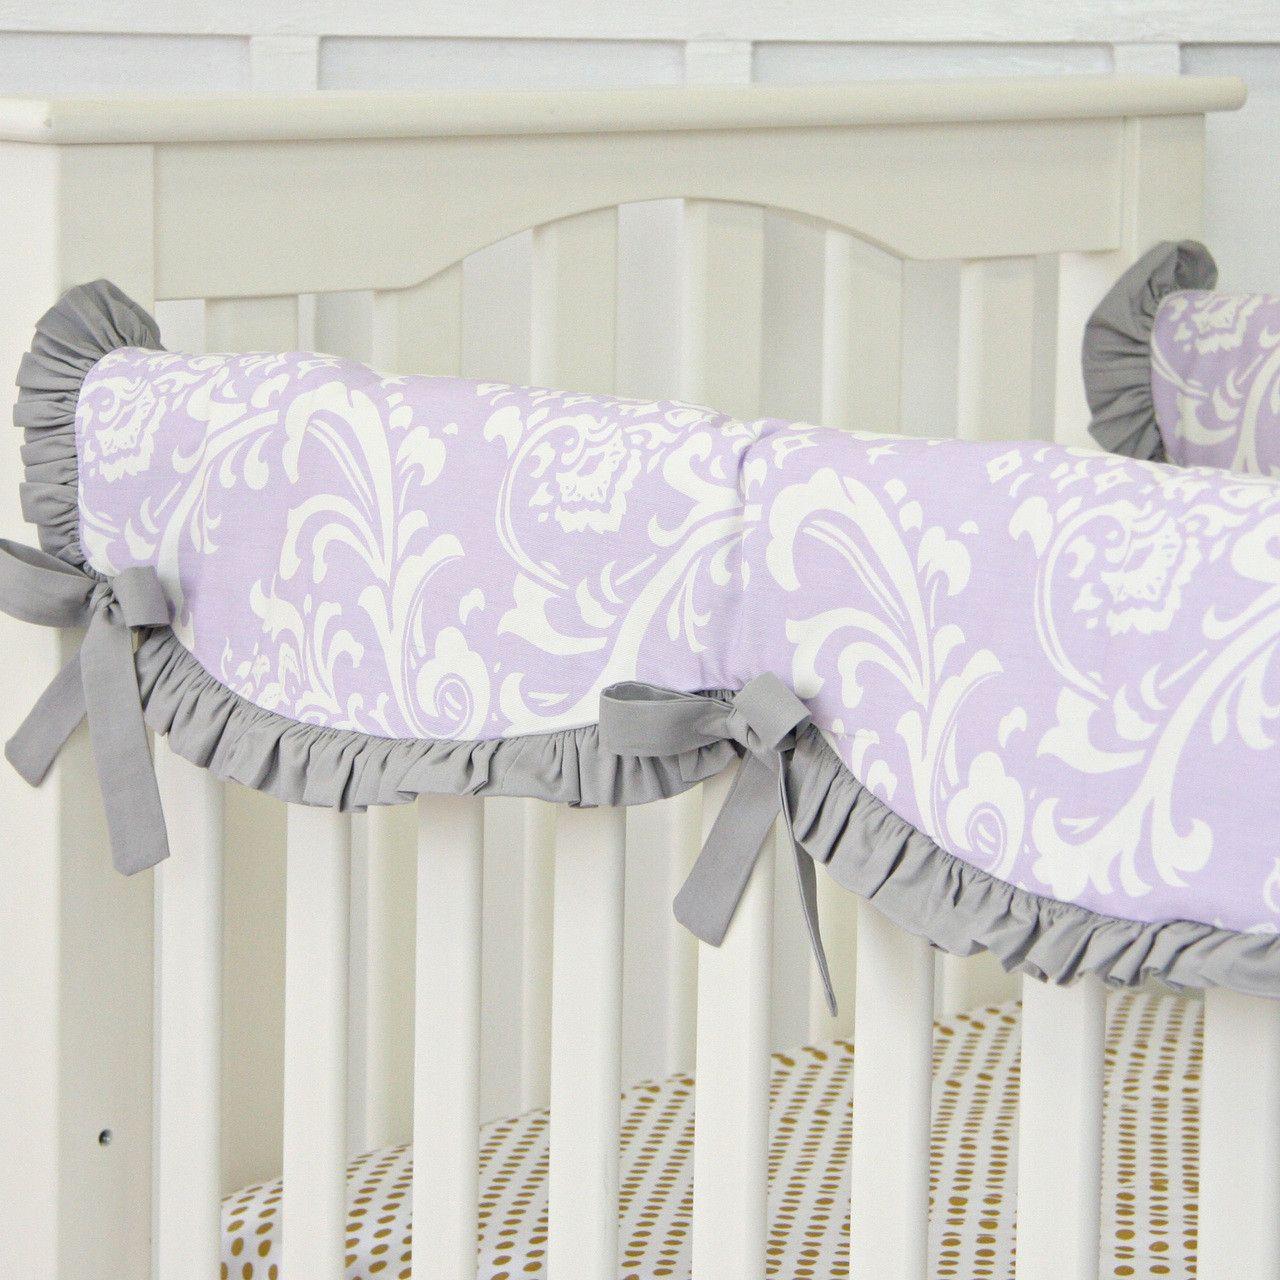 Crib Rail Cover Lavender Sweet Lace Damask